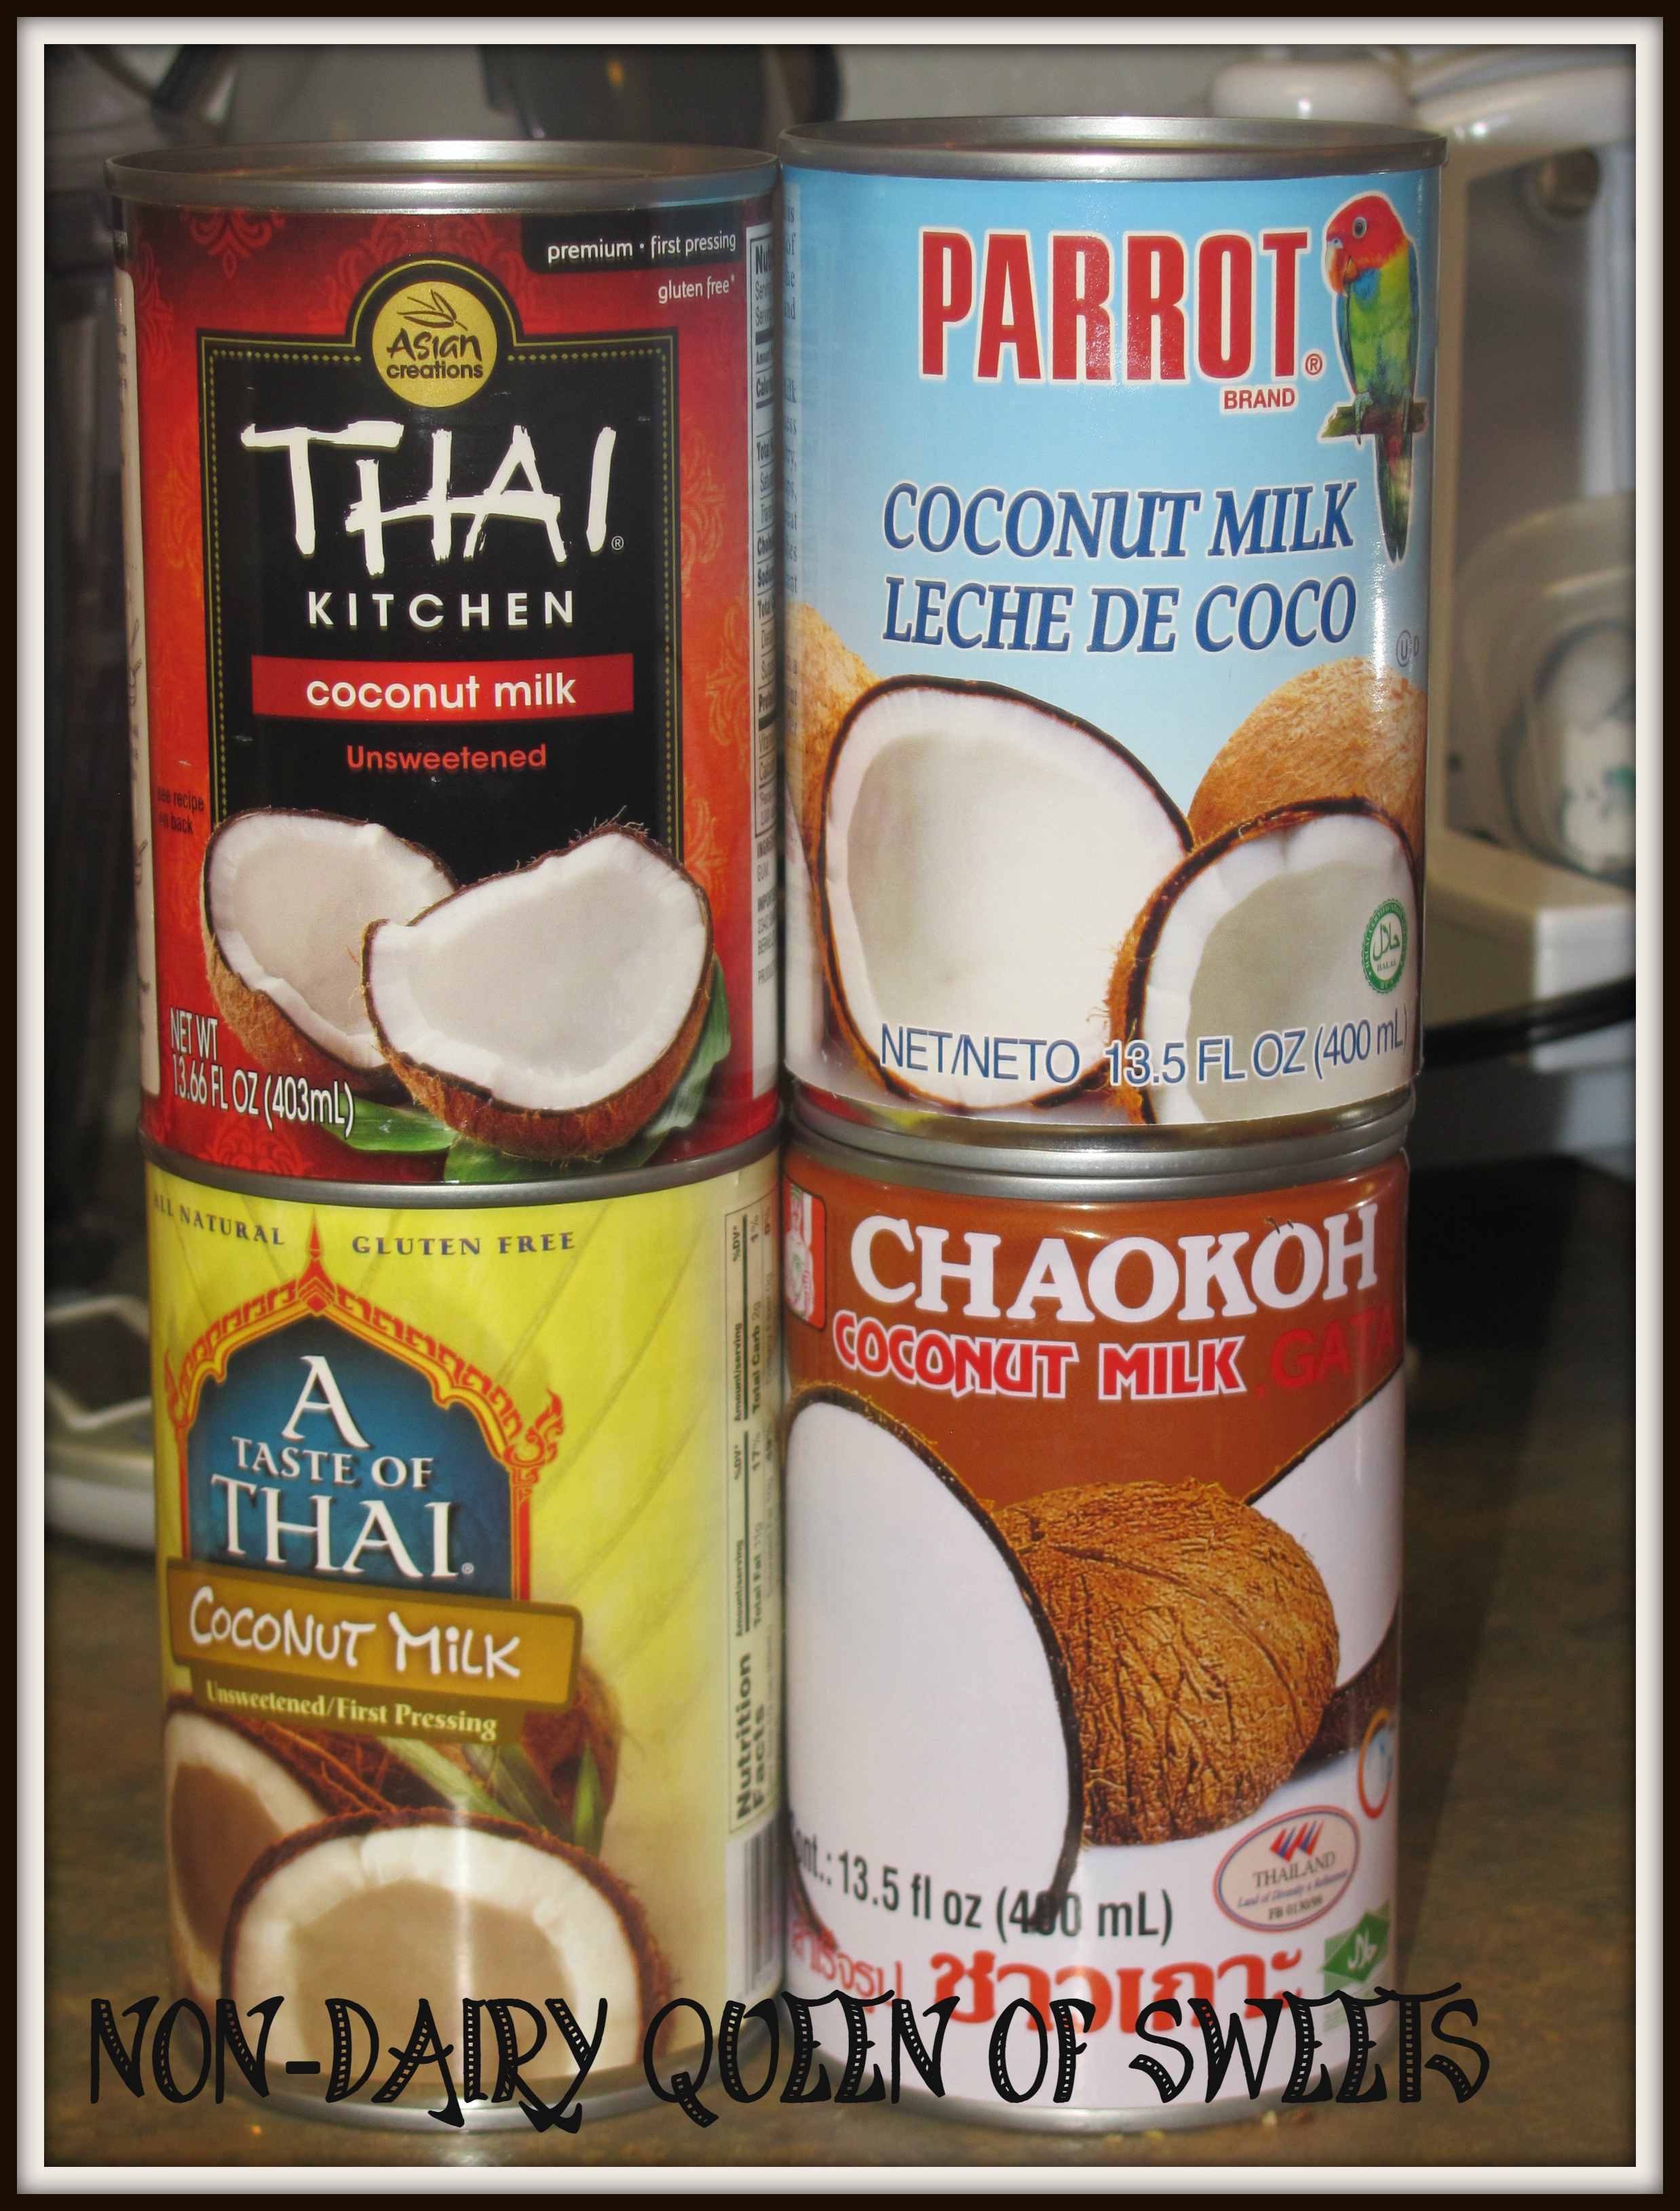 A Taste Of Thai Coconut Milk almond milk – nondairyqueenofsweets